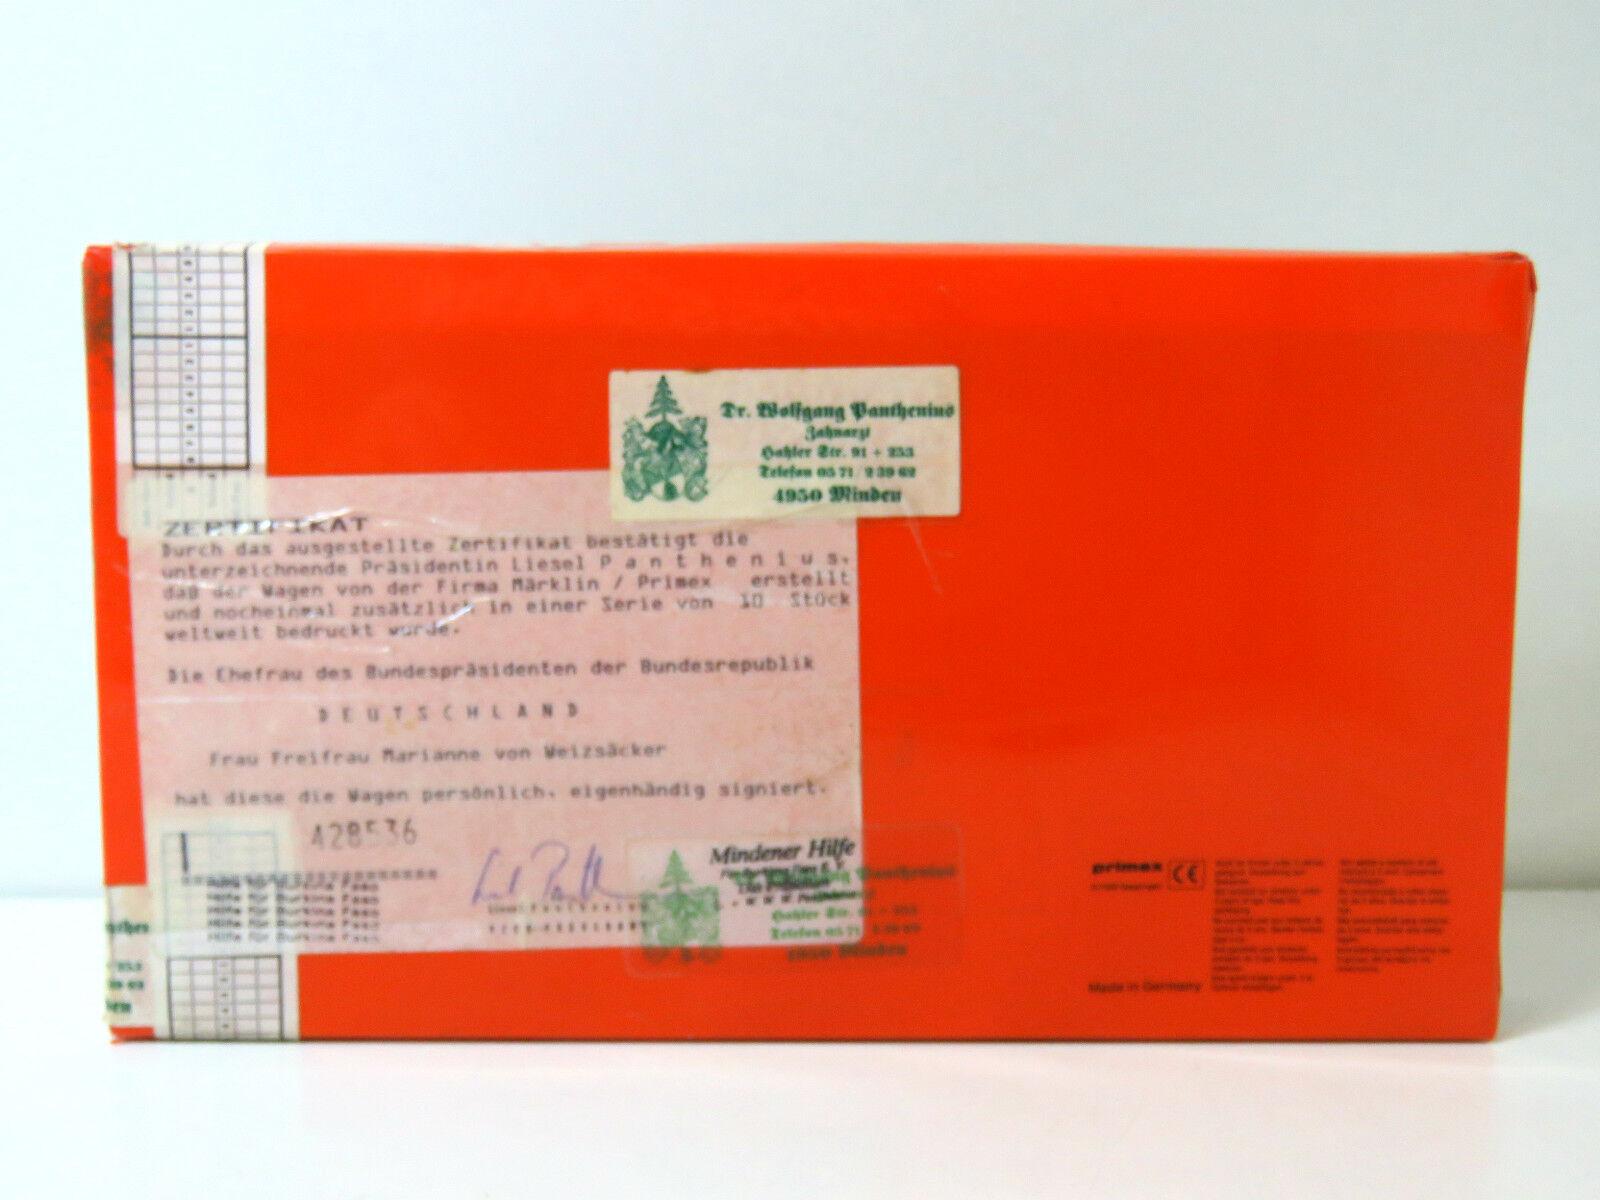 Rareza  ayuda para burkina faso, Marianne V Weizsäcker, lim.10 St, primex ho, UW